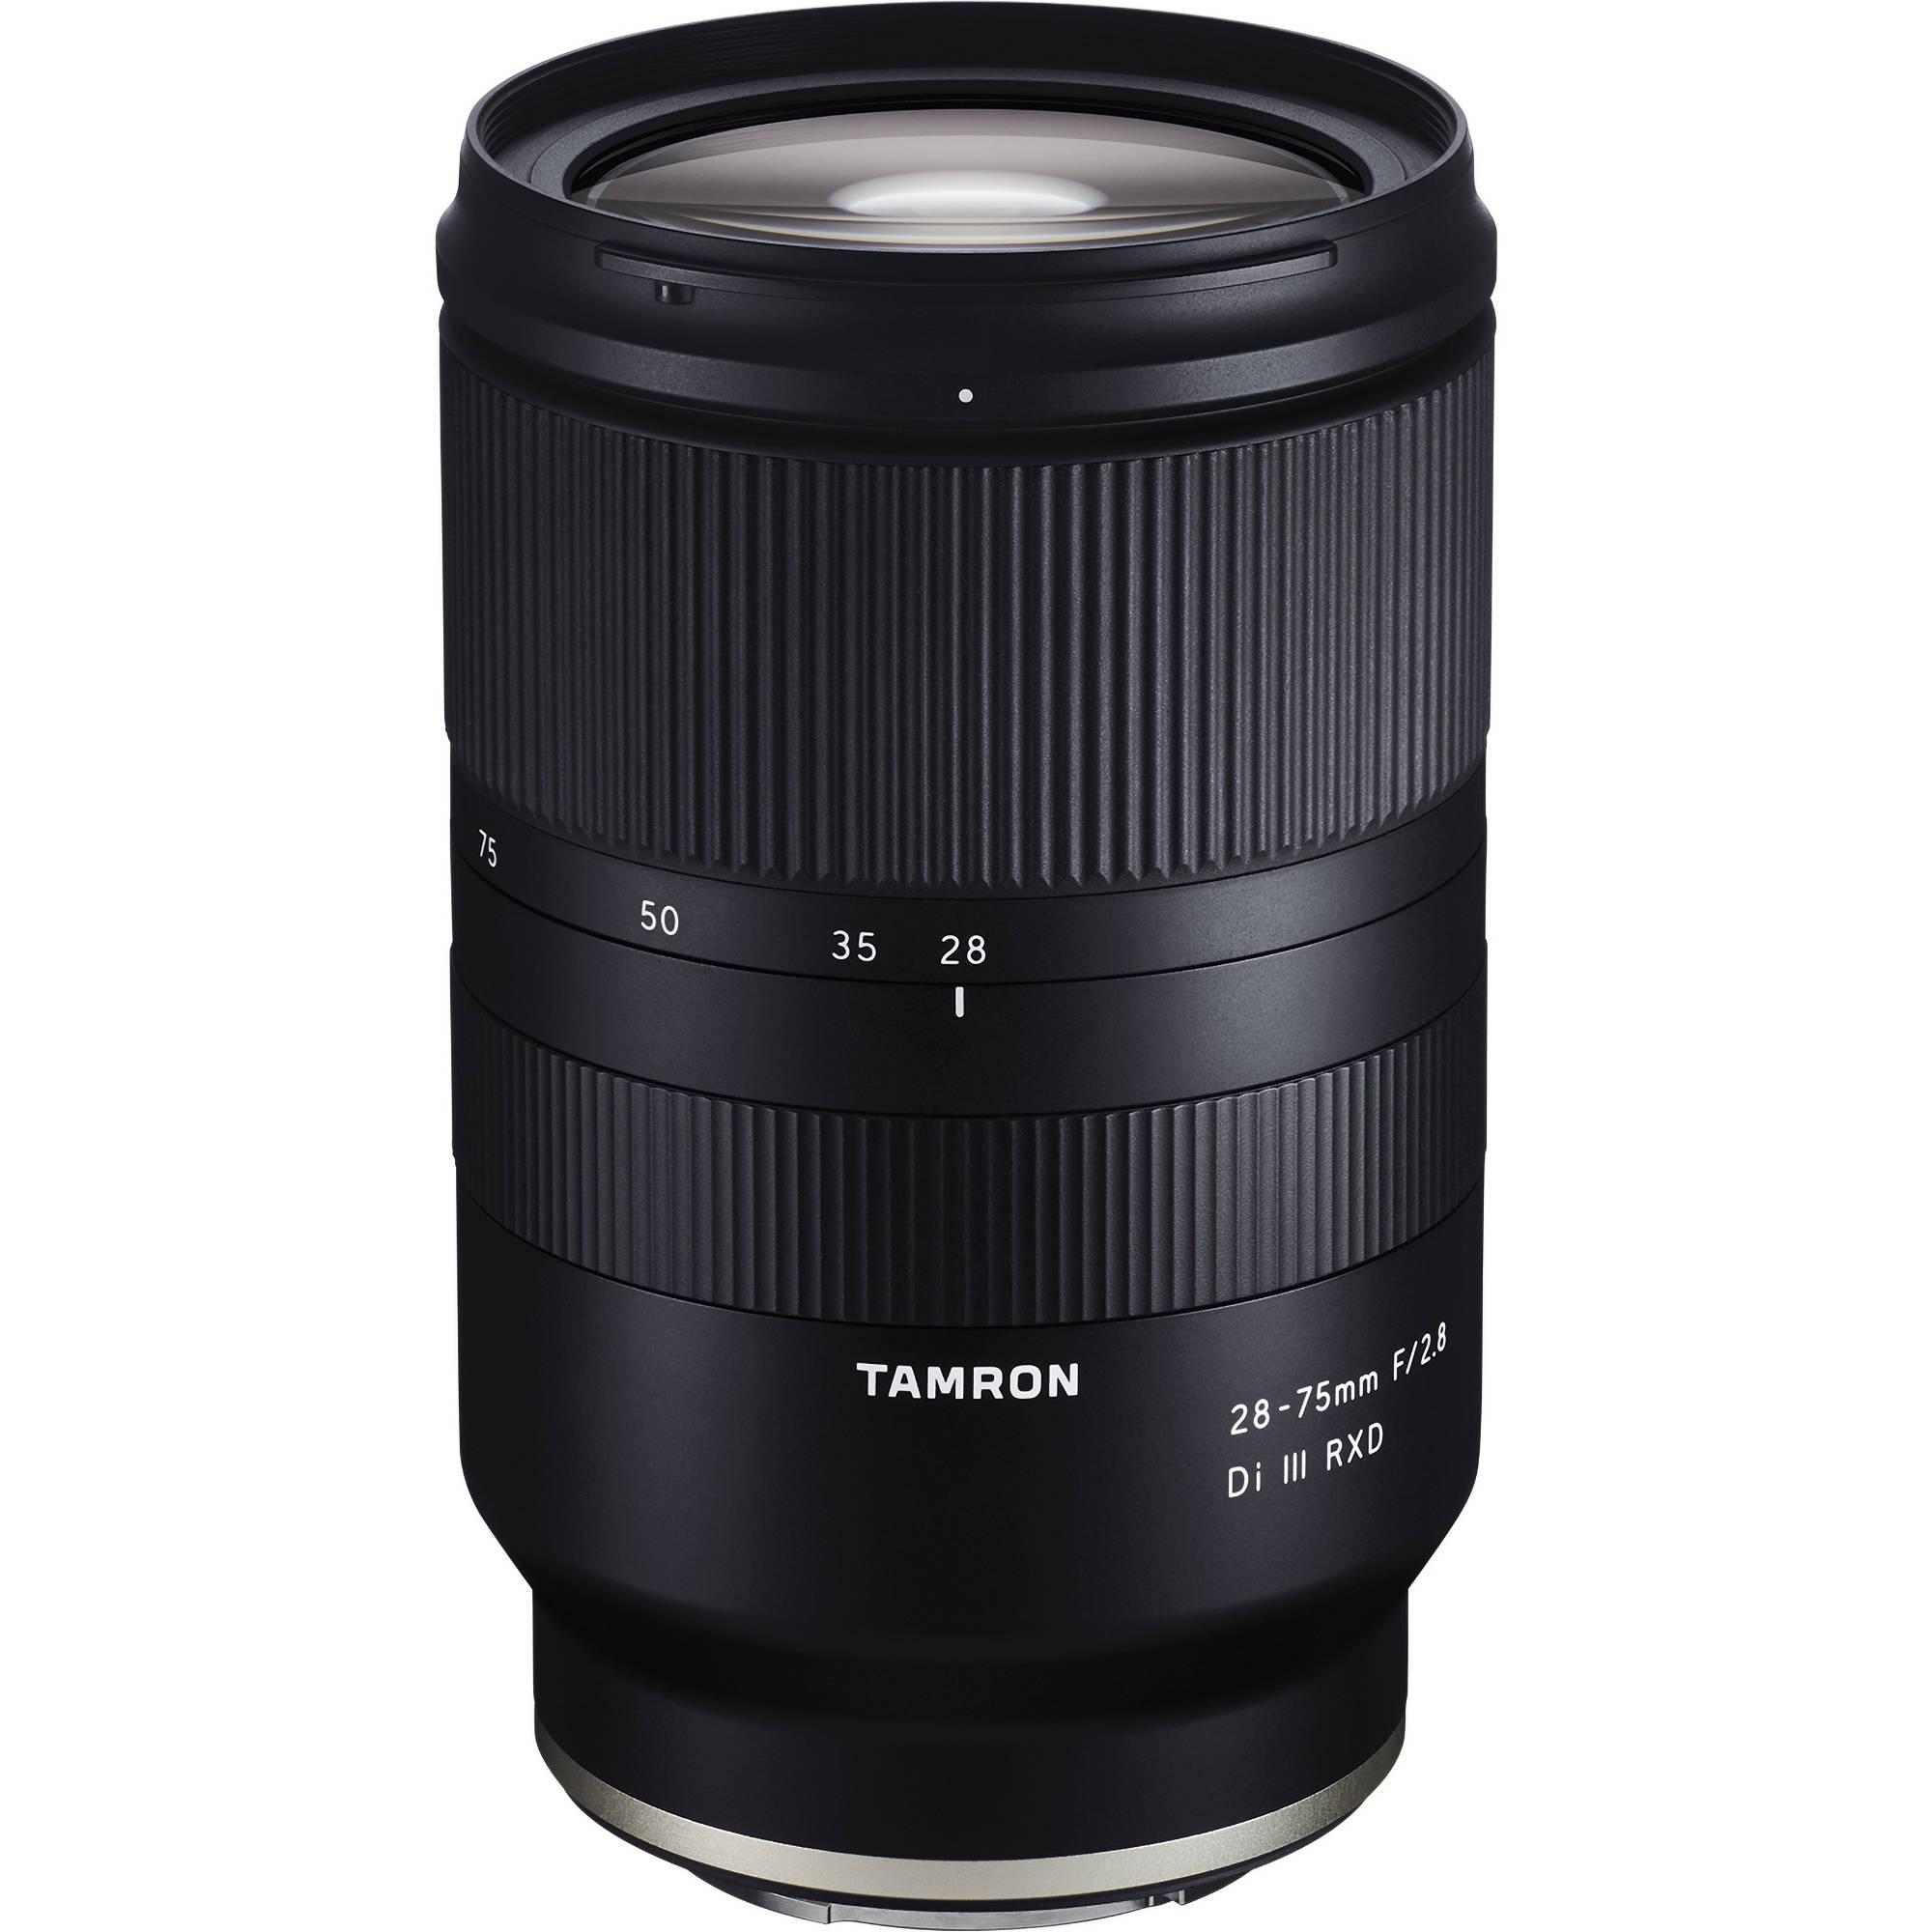 8990184747 Tamron 28-75mm f/2.8 Di III RXD Lens for Sony E A036 B&H Photo